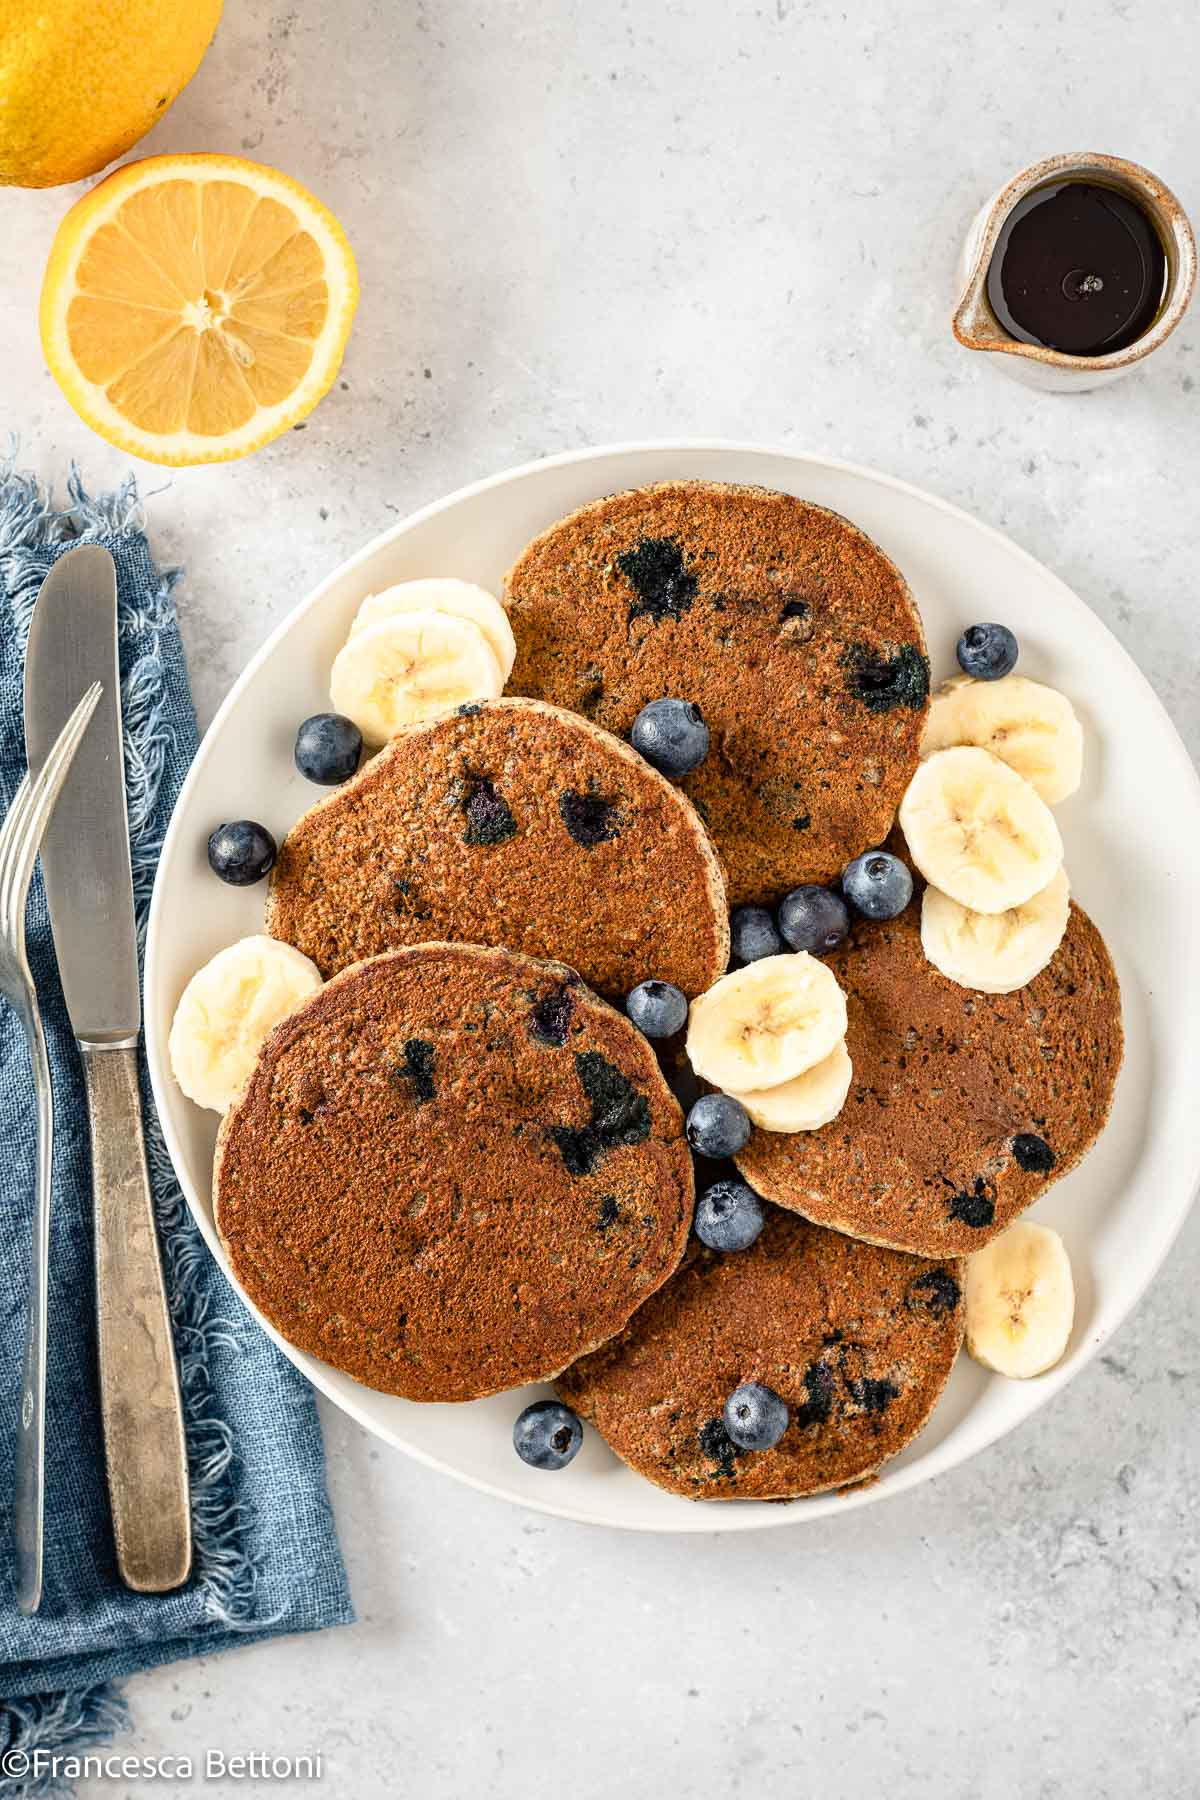 ricetta PANCAKES BANANA e MIRTILLI VEGAN SENZA GLIUTINE grano saraceno gluten-free Vegan Banana Blueberry Pancakes recipe